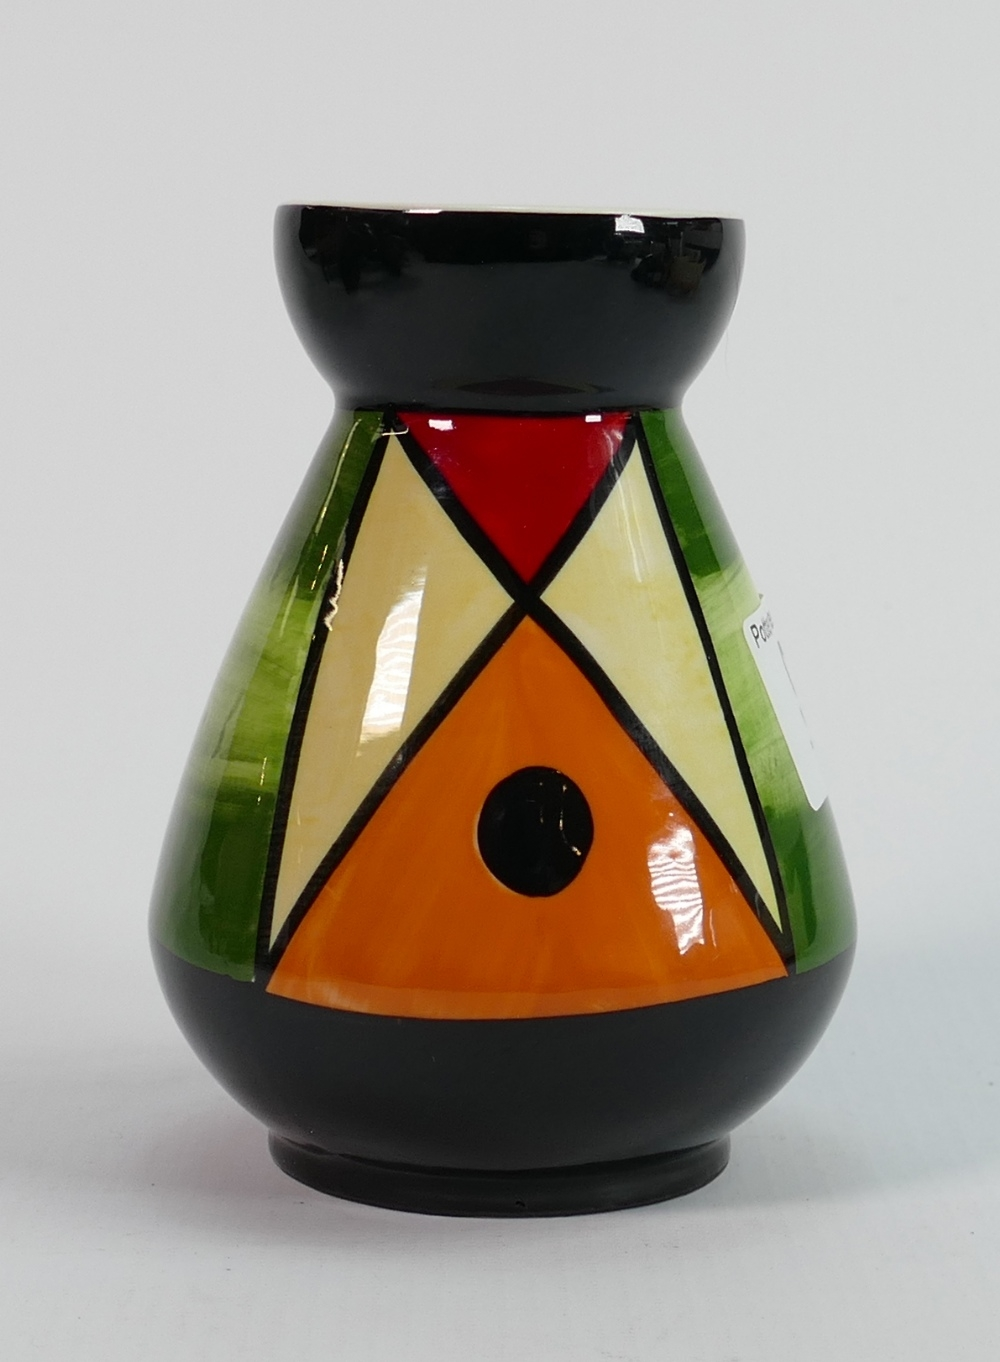 Lorna Bailey limited edition vase 2/2: 12cm high.